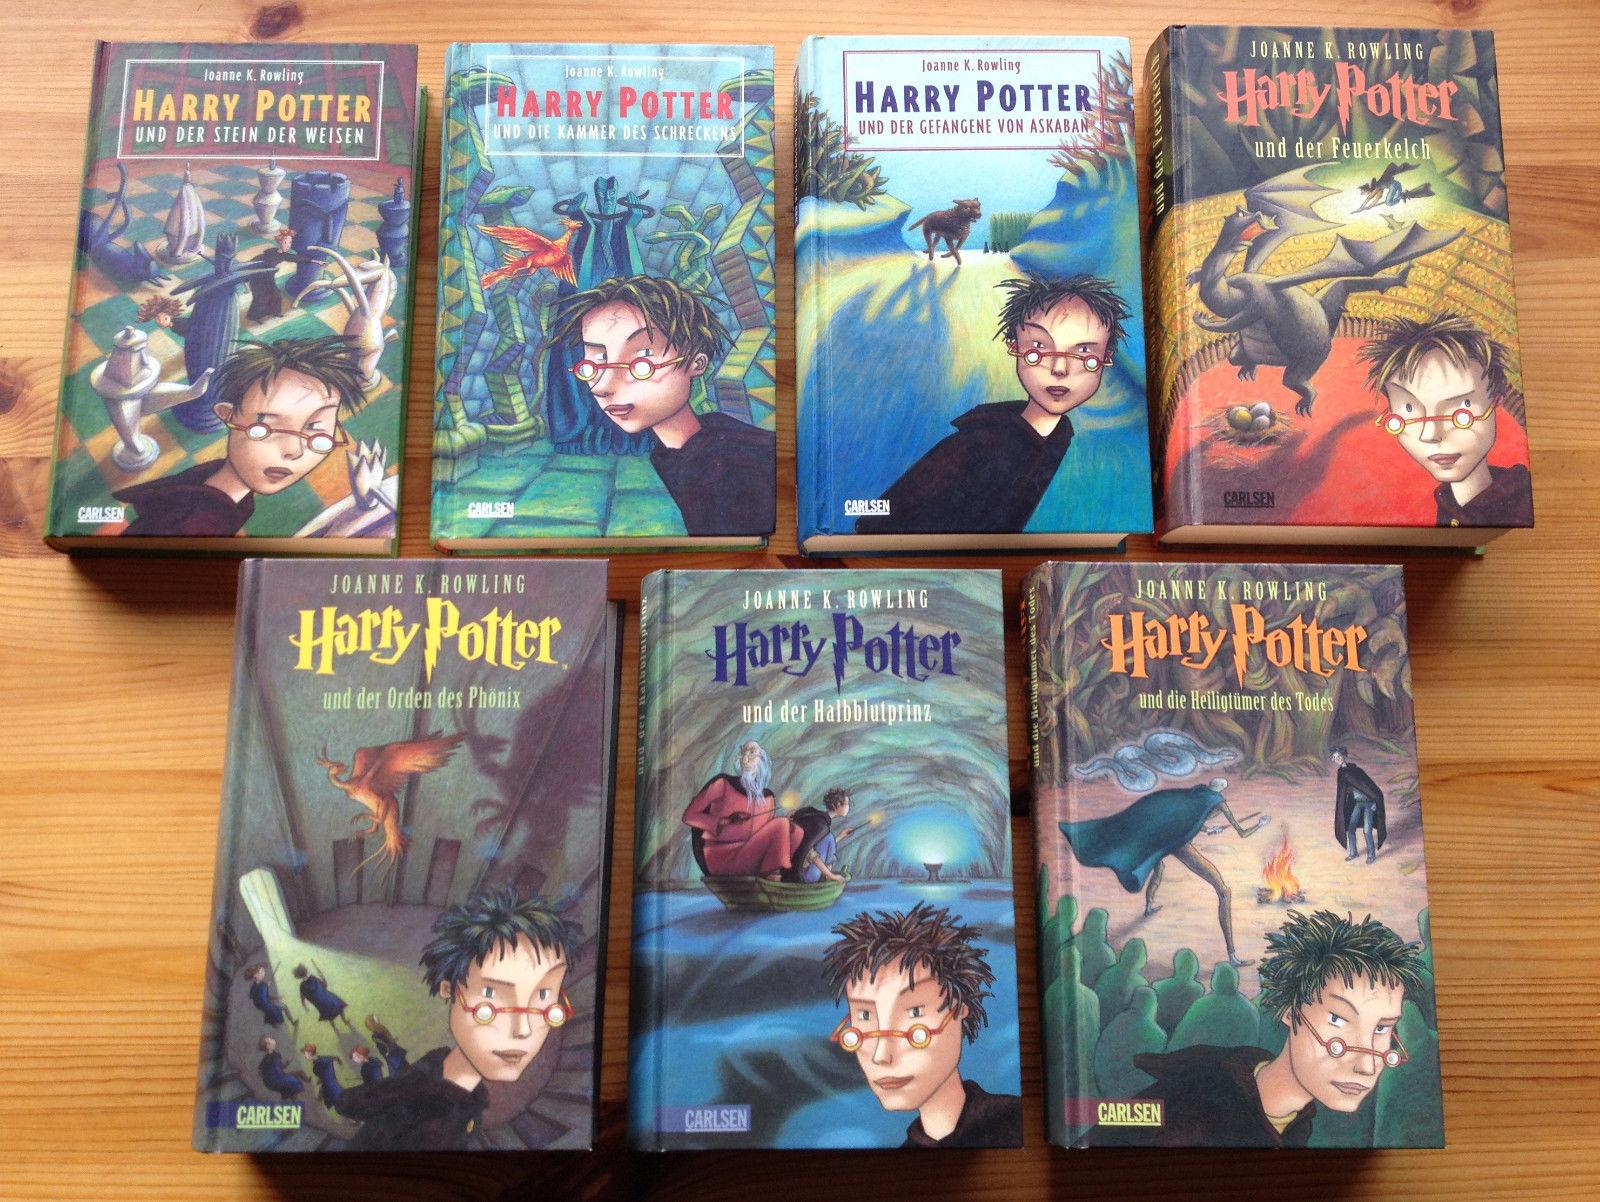 Harry Potter | Band 1-7 komplett | Gebundene deutsche Ausgabe | J.K. Rowling